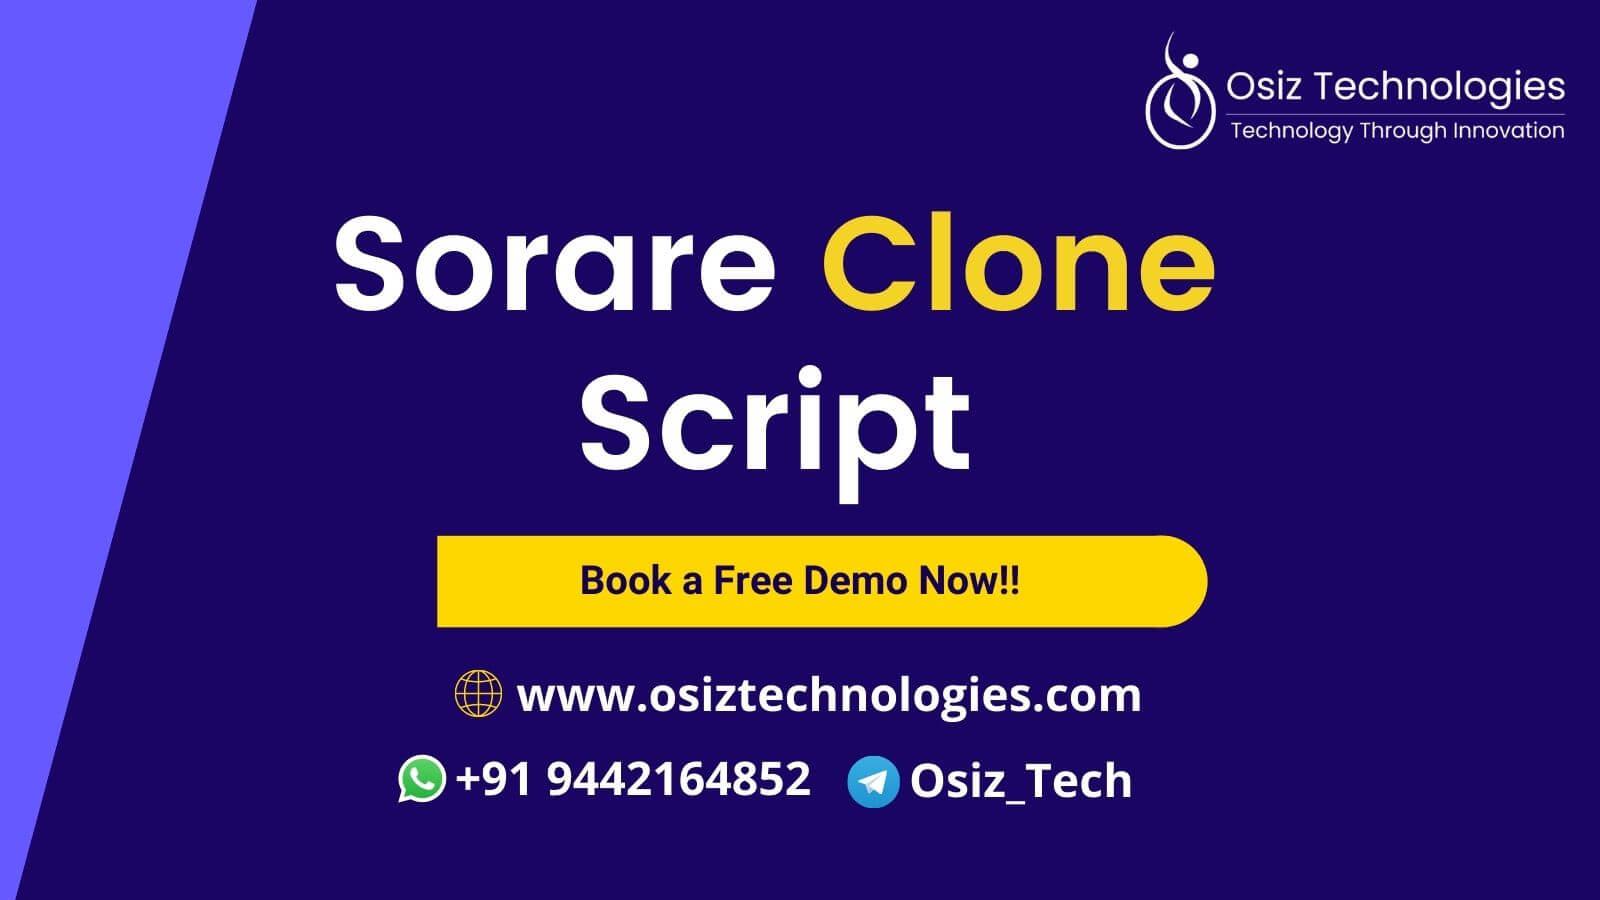 Sorare Clone Script - To Launch NFT MarketPlace for Football like Sorare